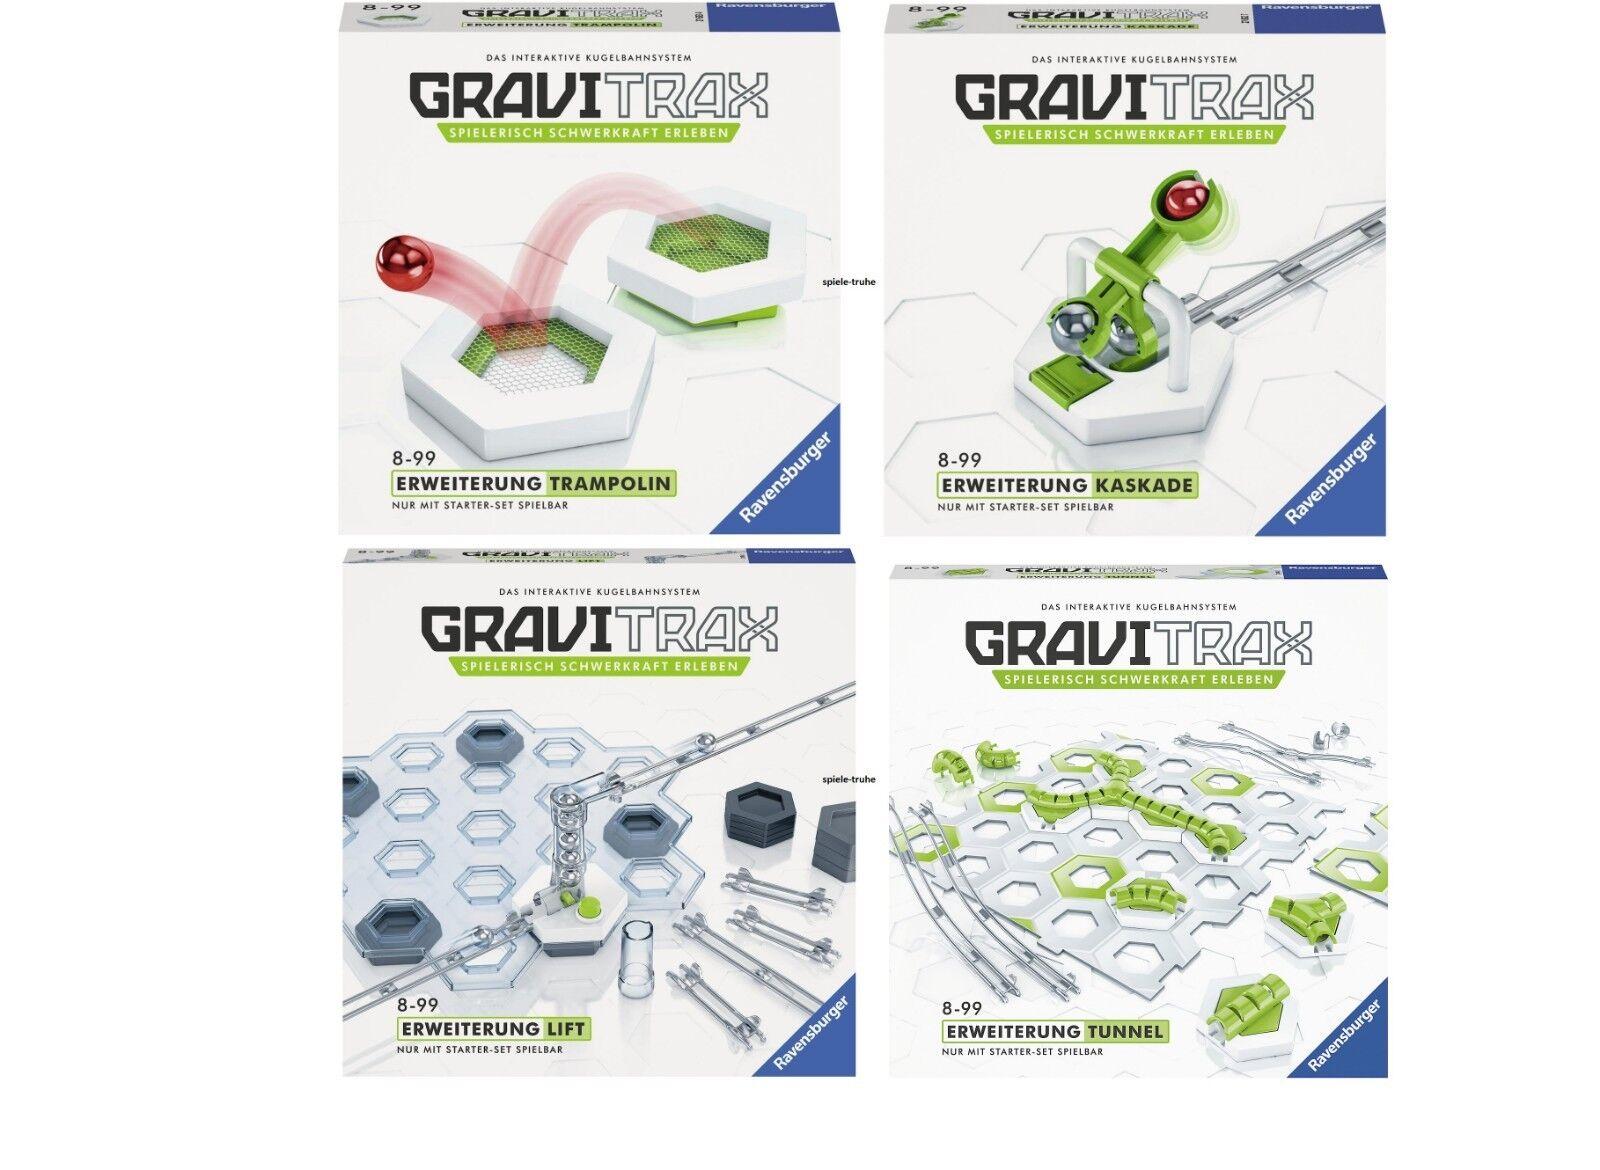 Ravensburger Gravitrax 4 New Extensions - Lift Tunnel Cascade Trampoline